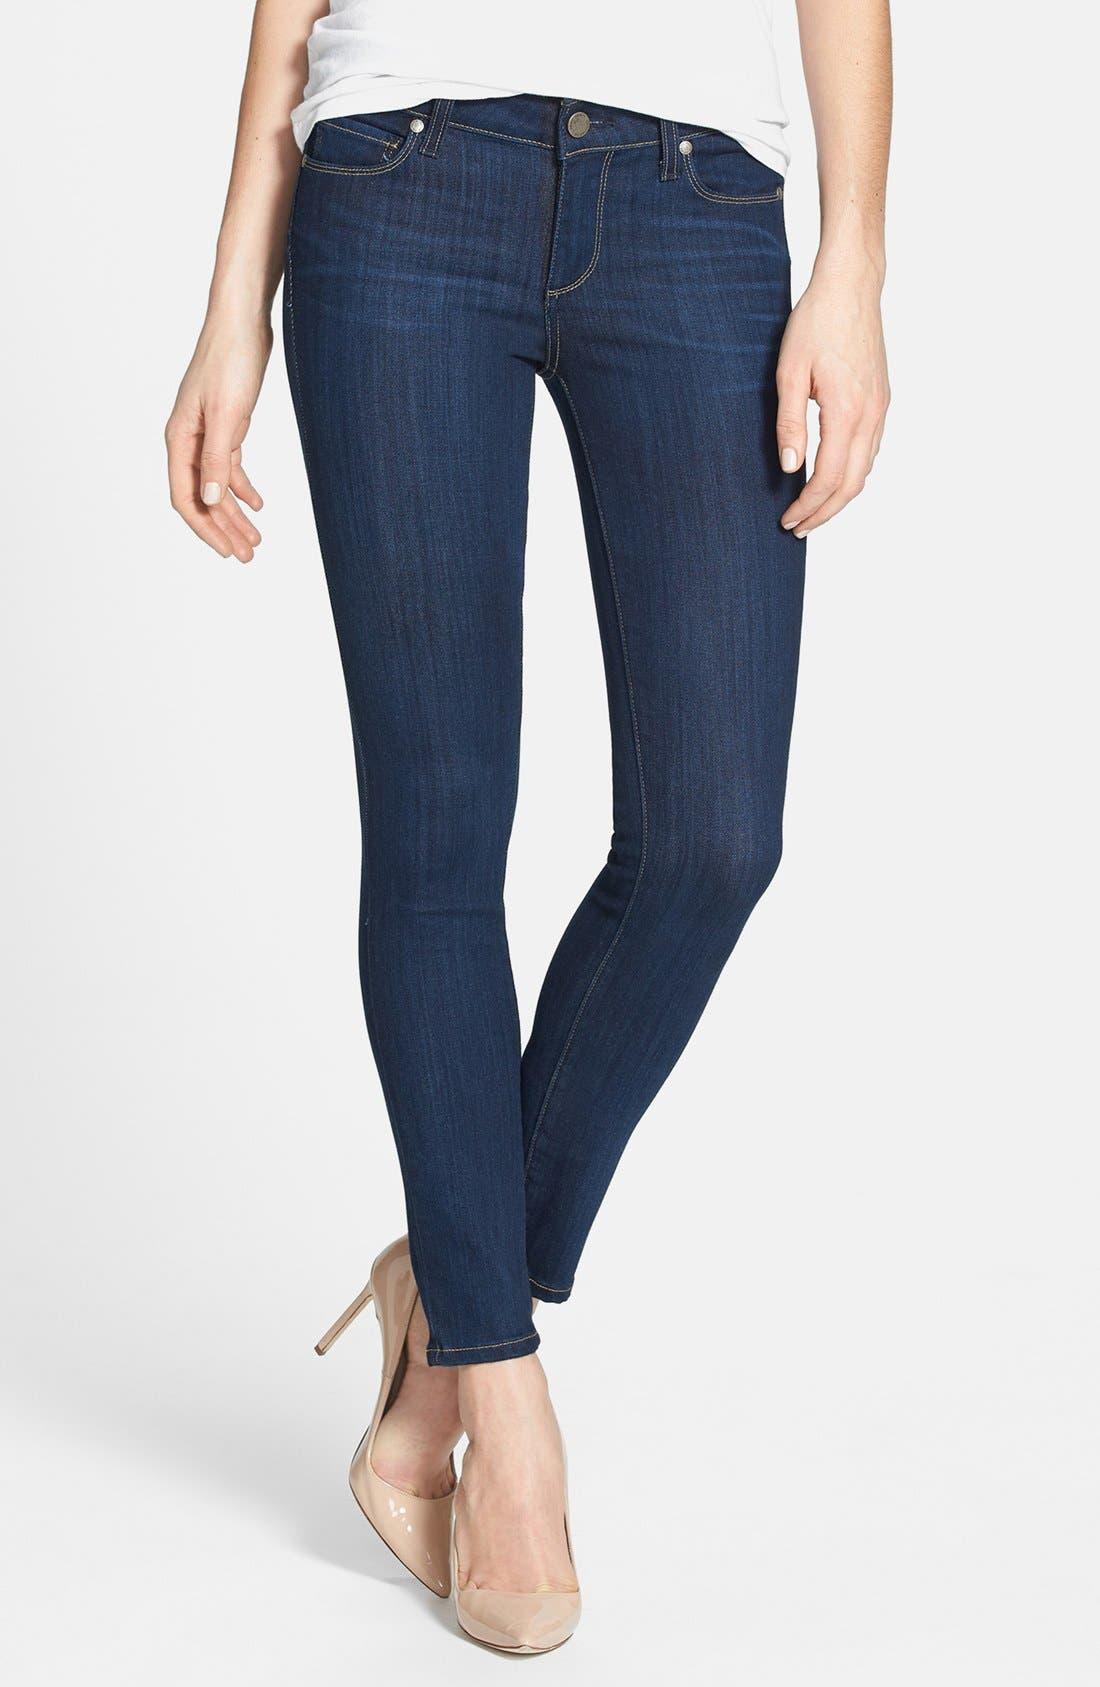 Main Image - Paige Denim 'Verdugo' Skinny Ankle Jeans (Ashbury)